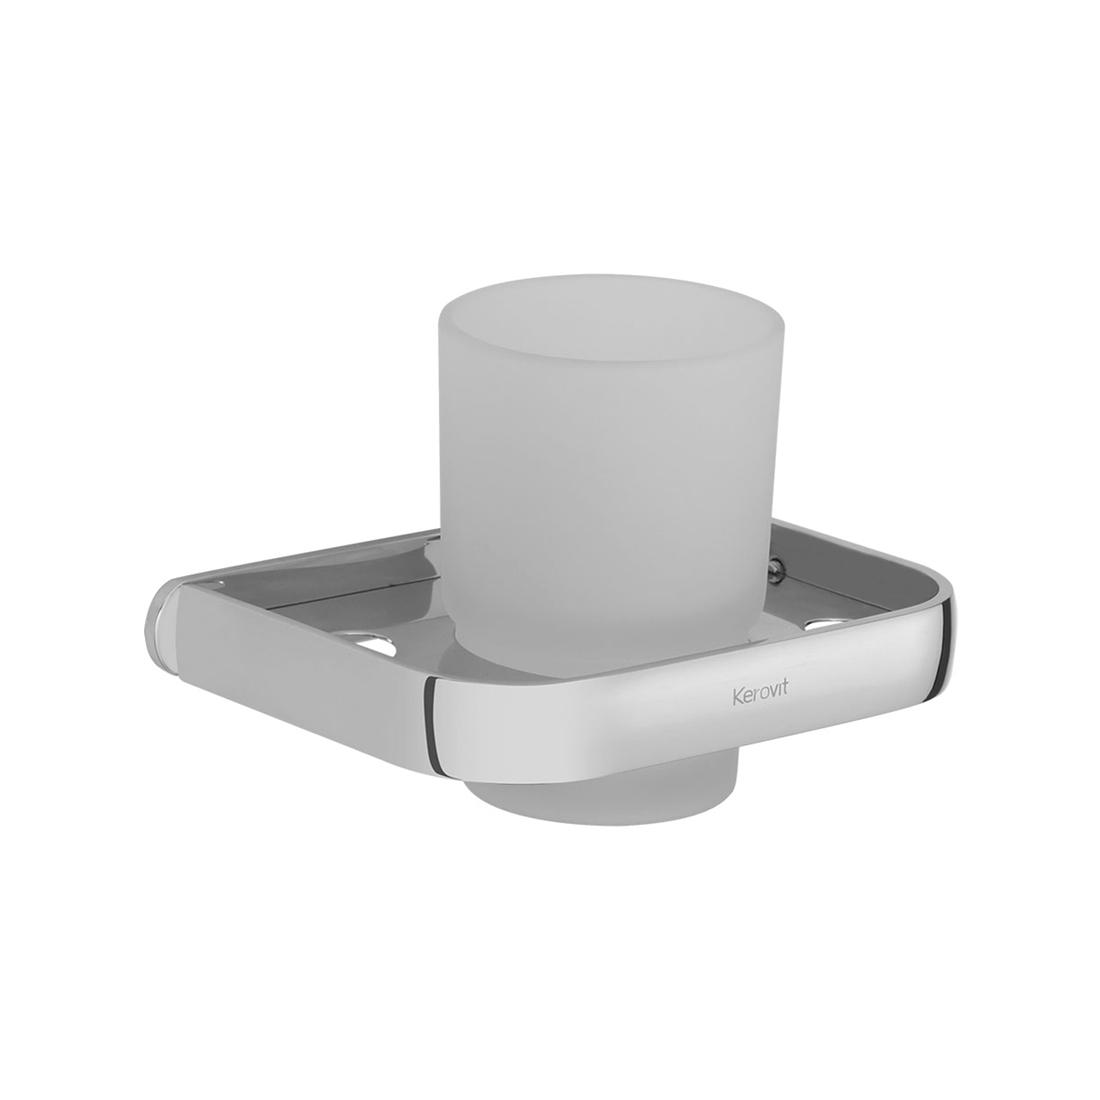 Kerovit KA660007 Convex Range Tumbler Holder